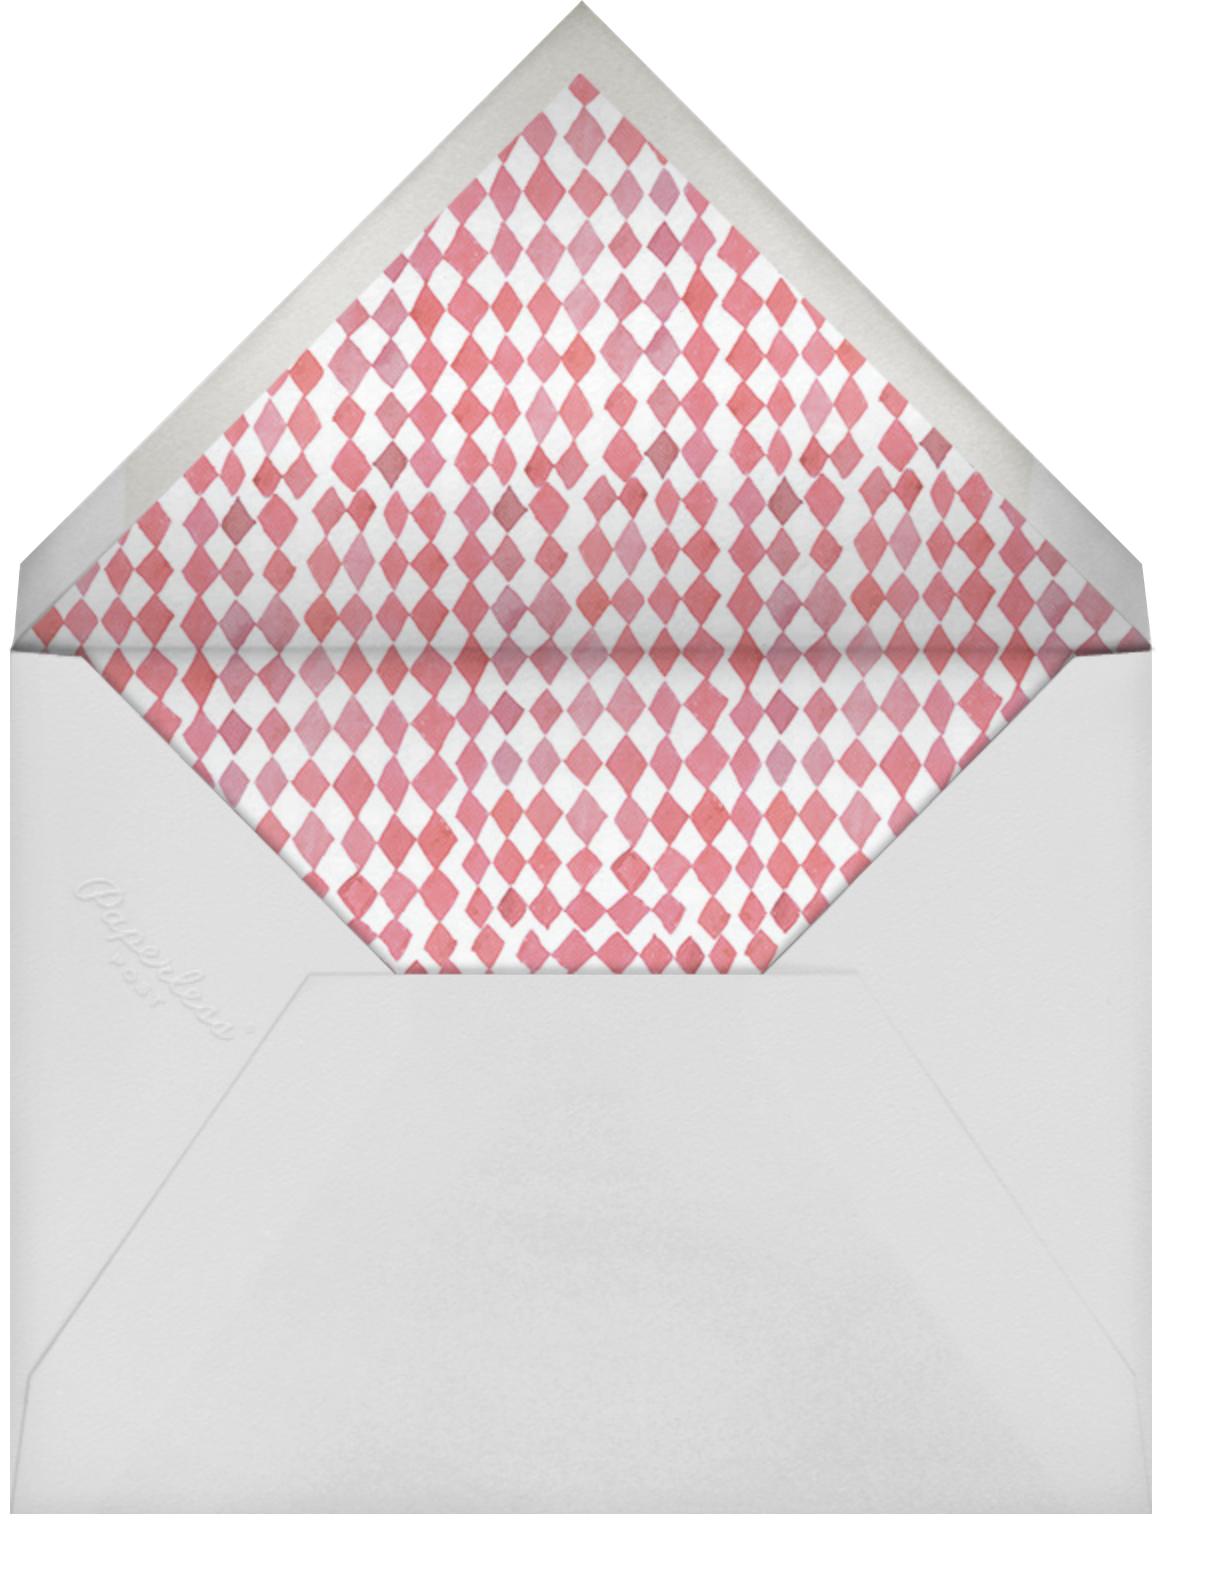 Three Tiers - Happy Menocal - Bridal shower - envelope back